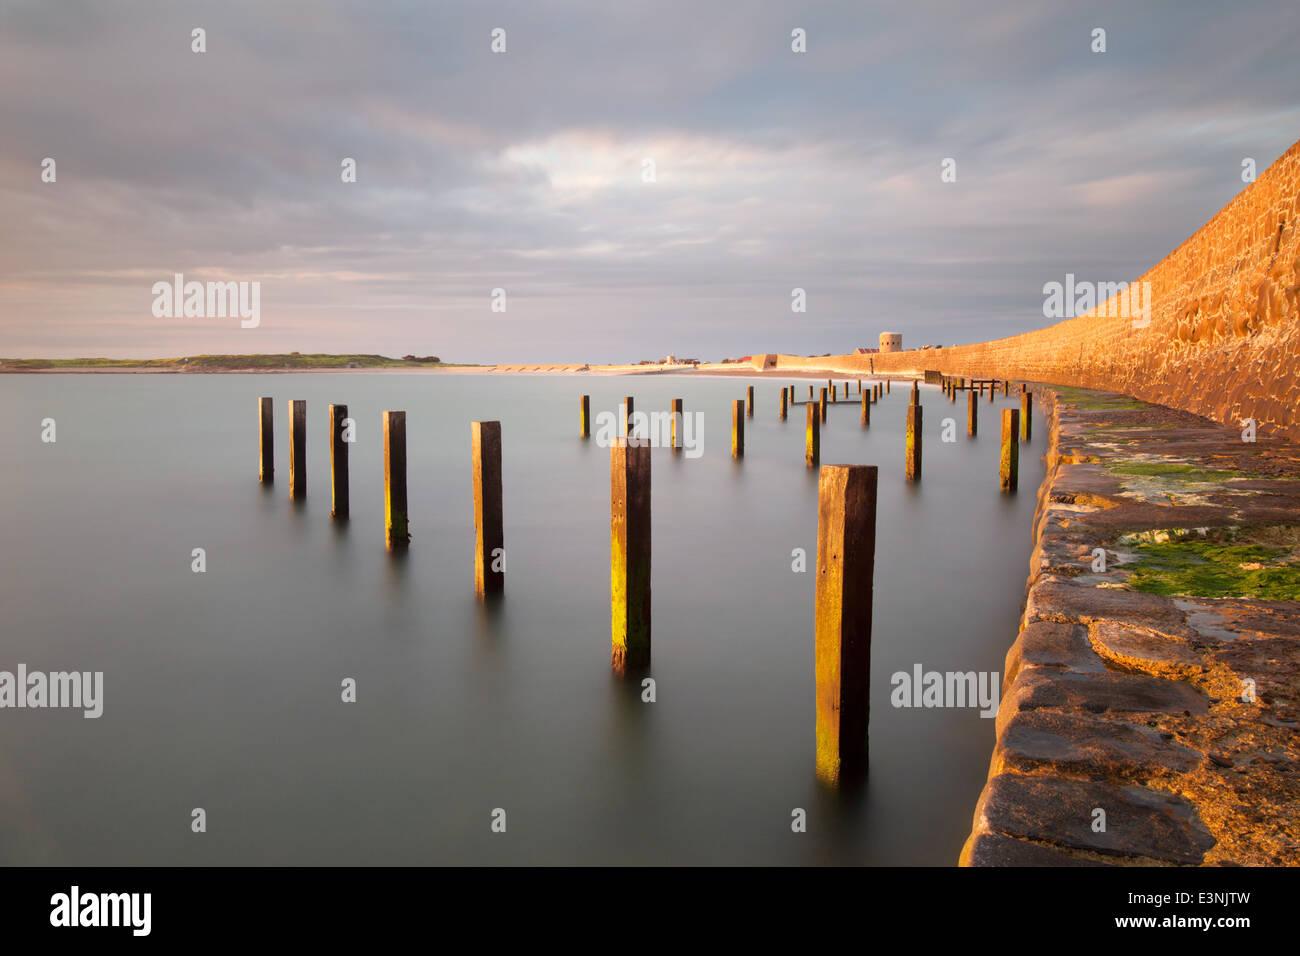 Vazon bay sea defence posts Guernsey - Stock Image